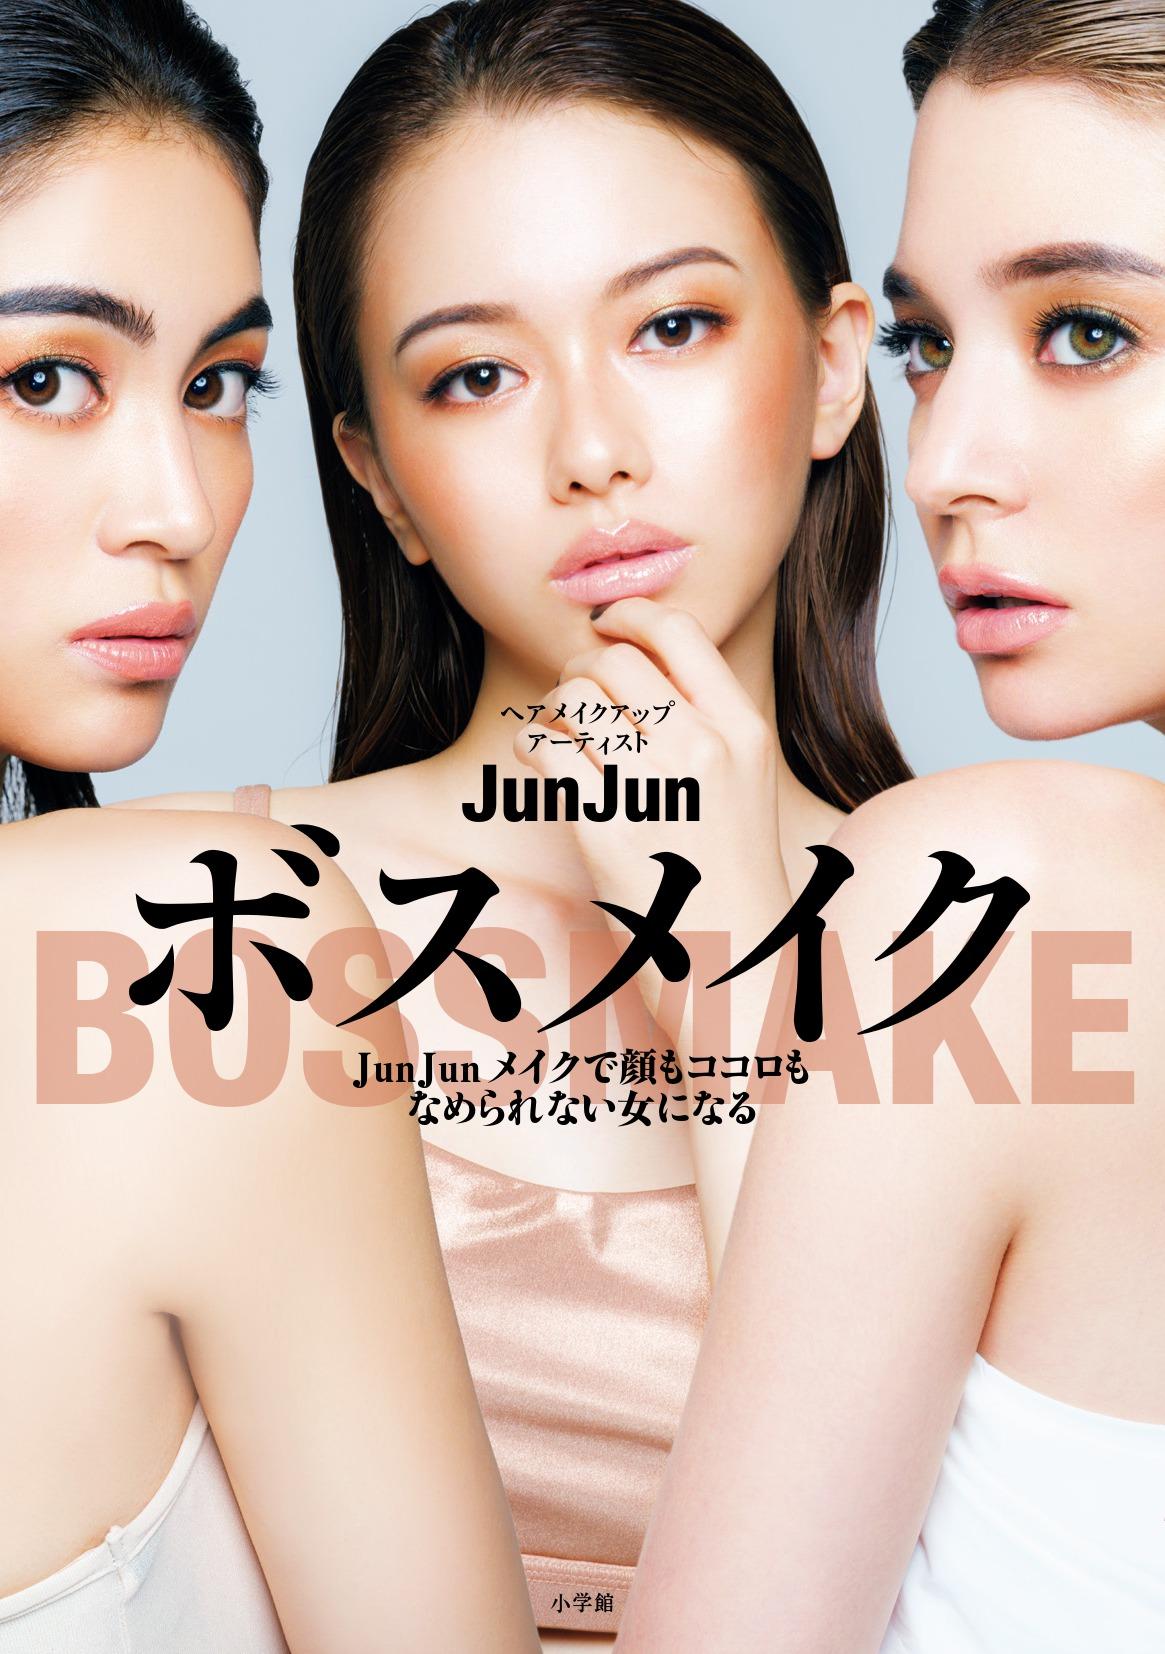 JunJun BOSSMAKE Tour 2019 6月15日(土)福岡公演